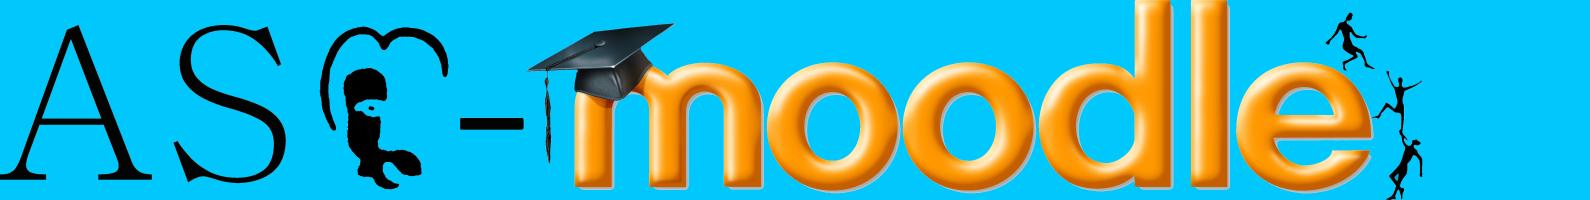 ASG-Moodle